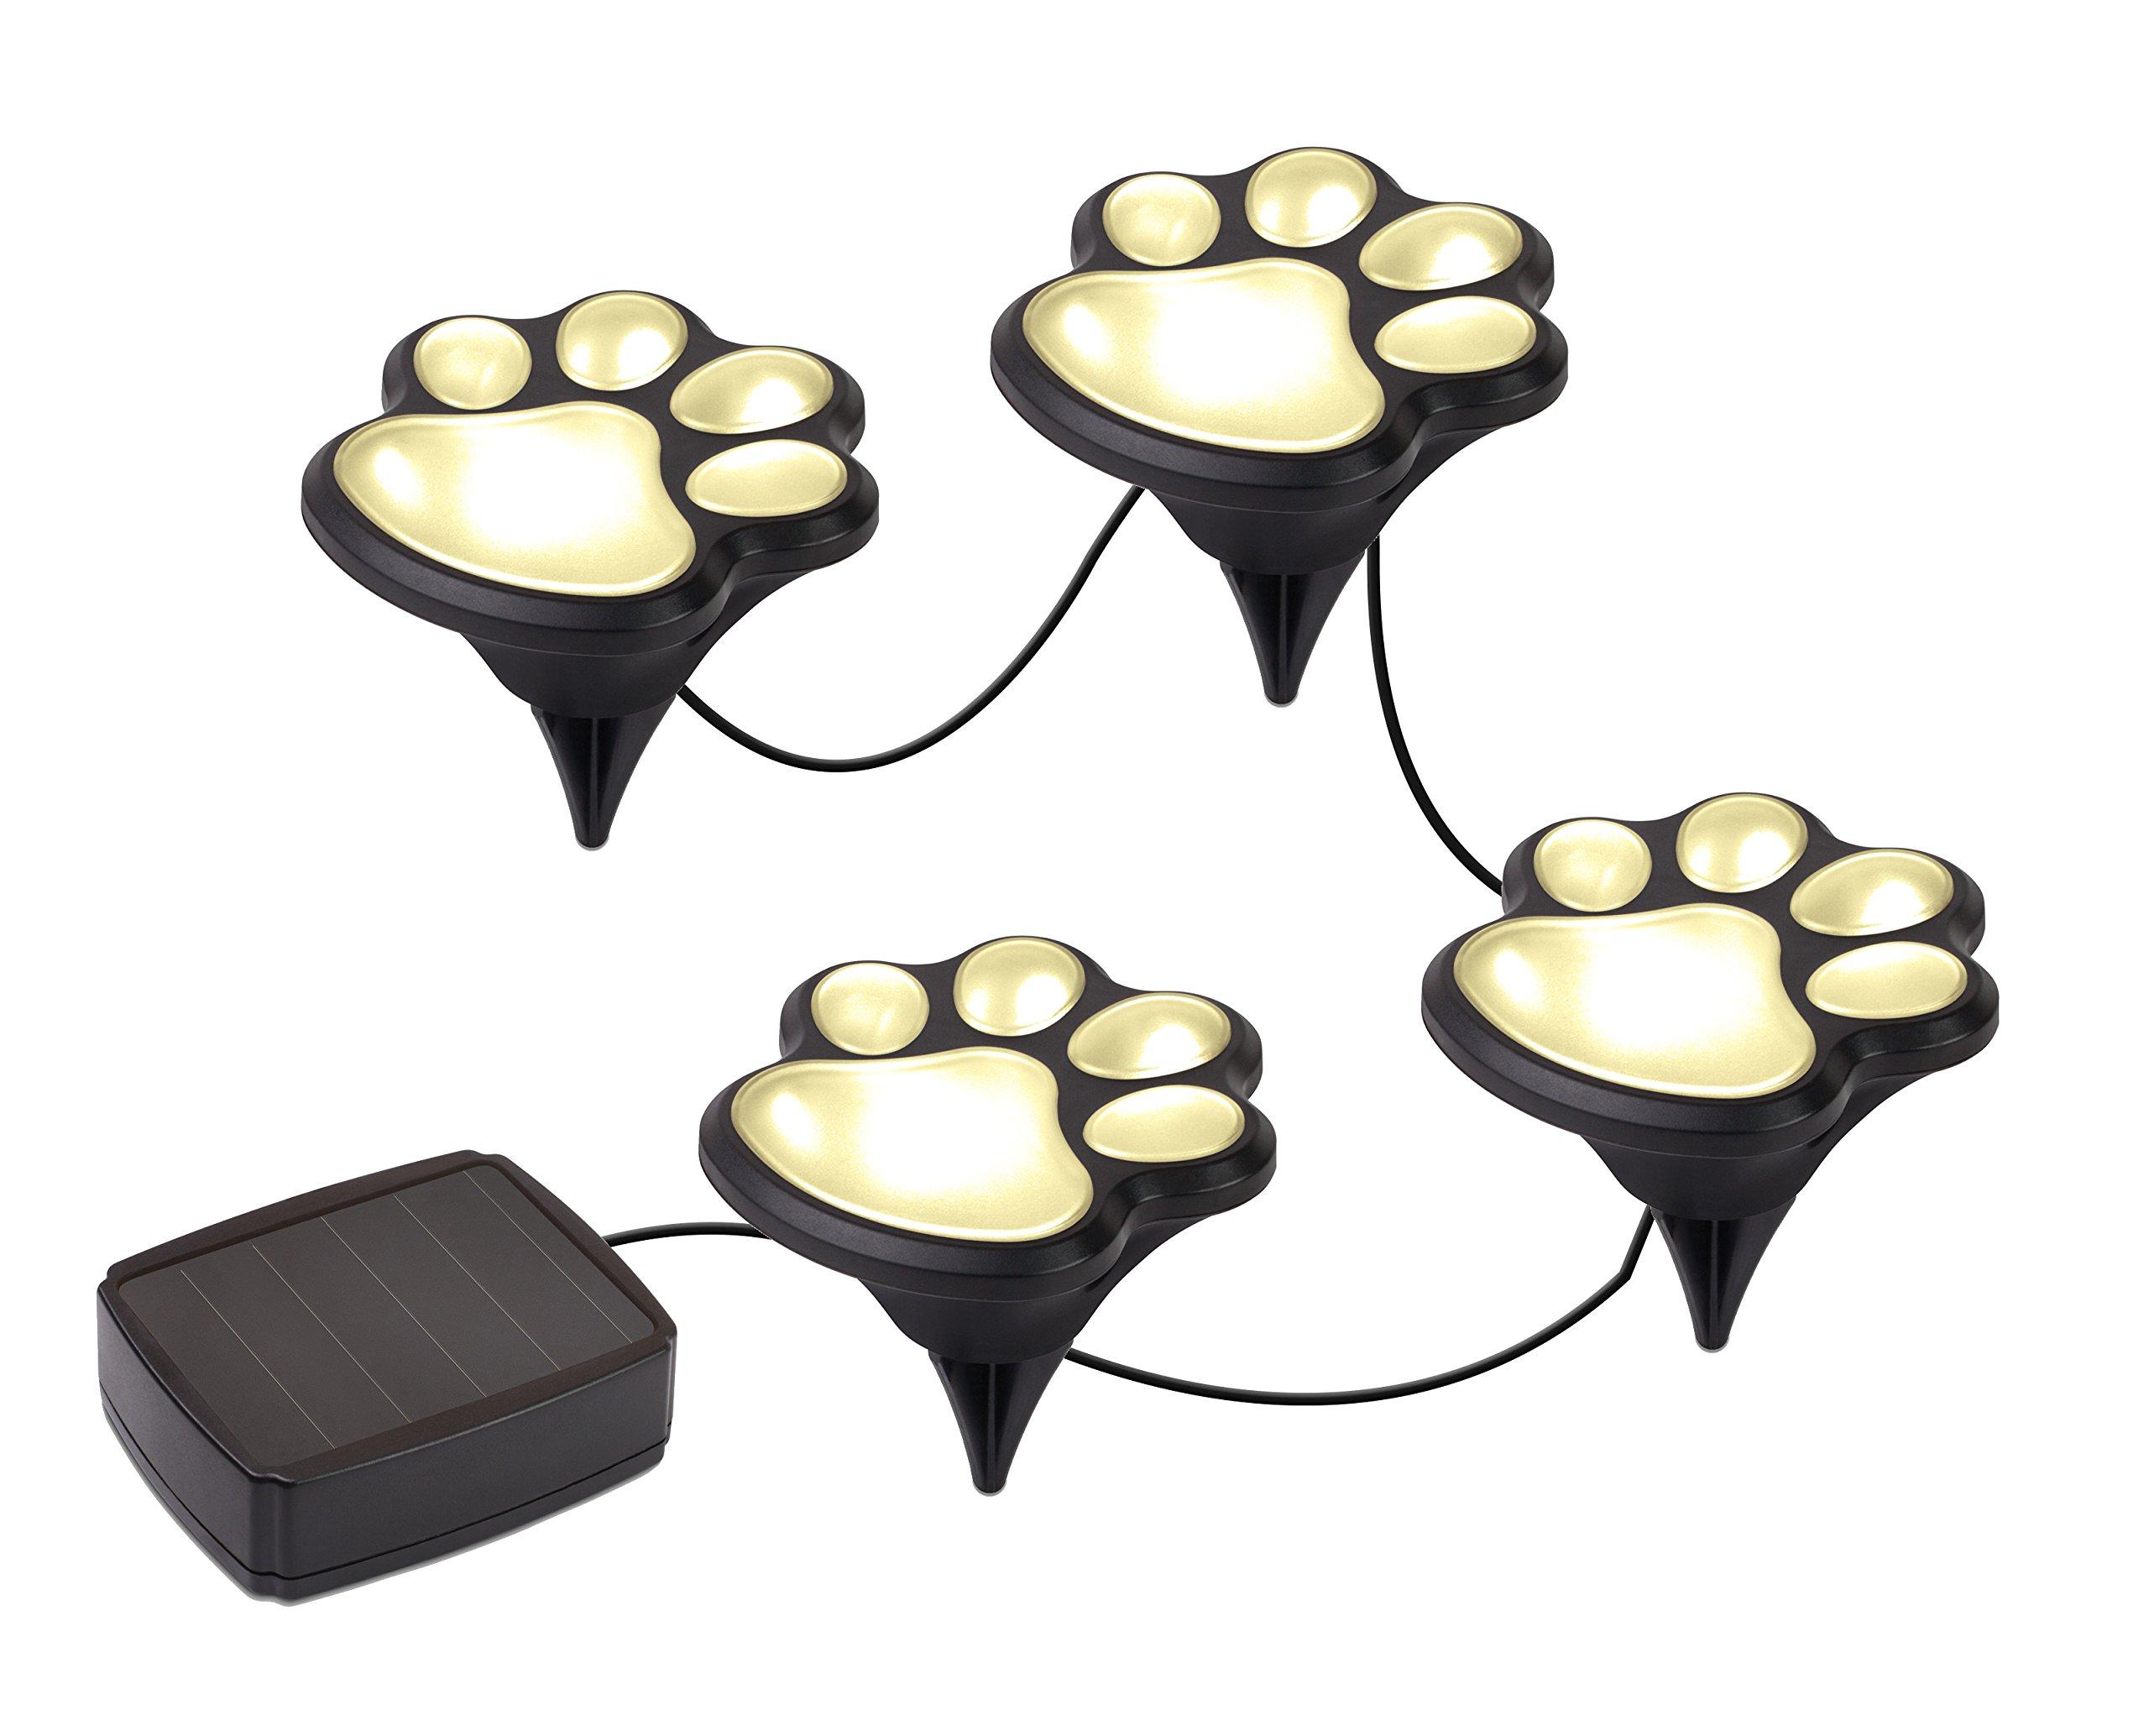 Solar Decorative Paw Print Garden Lights - Solar Powered Paws Home and Garden Walkway Lighting Outdoor Decor